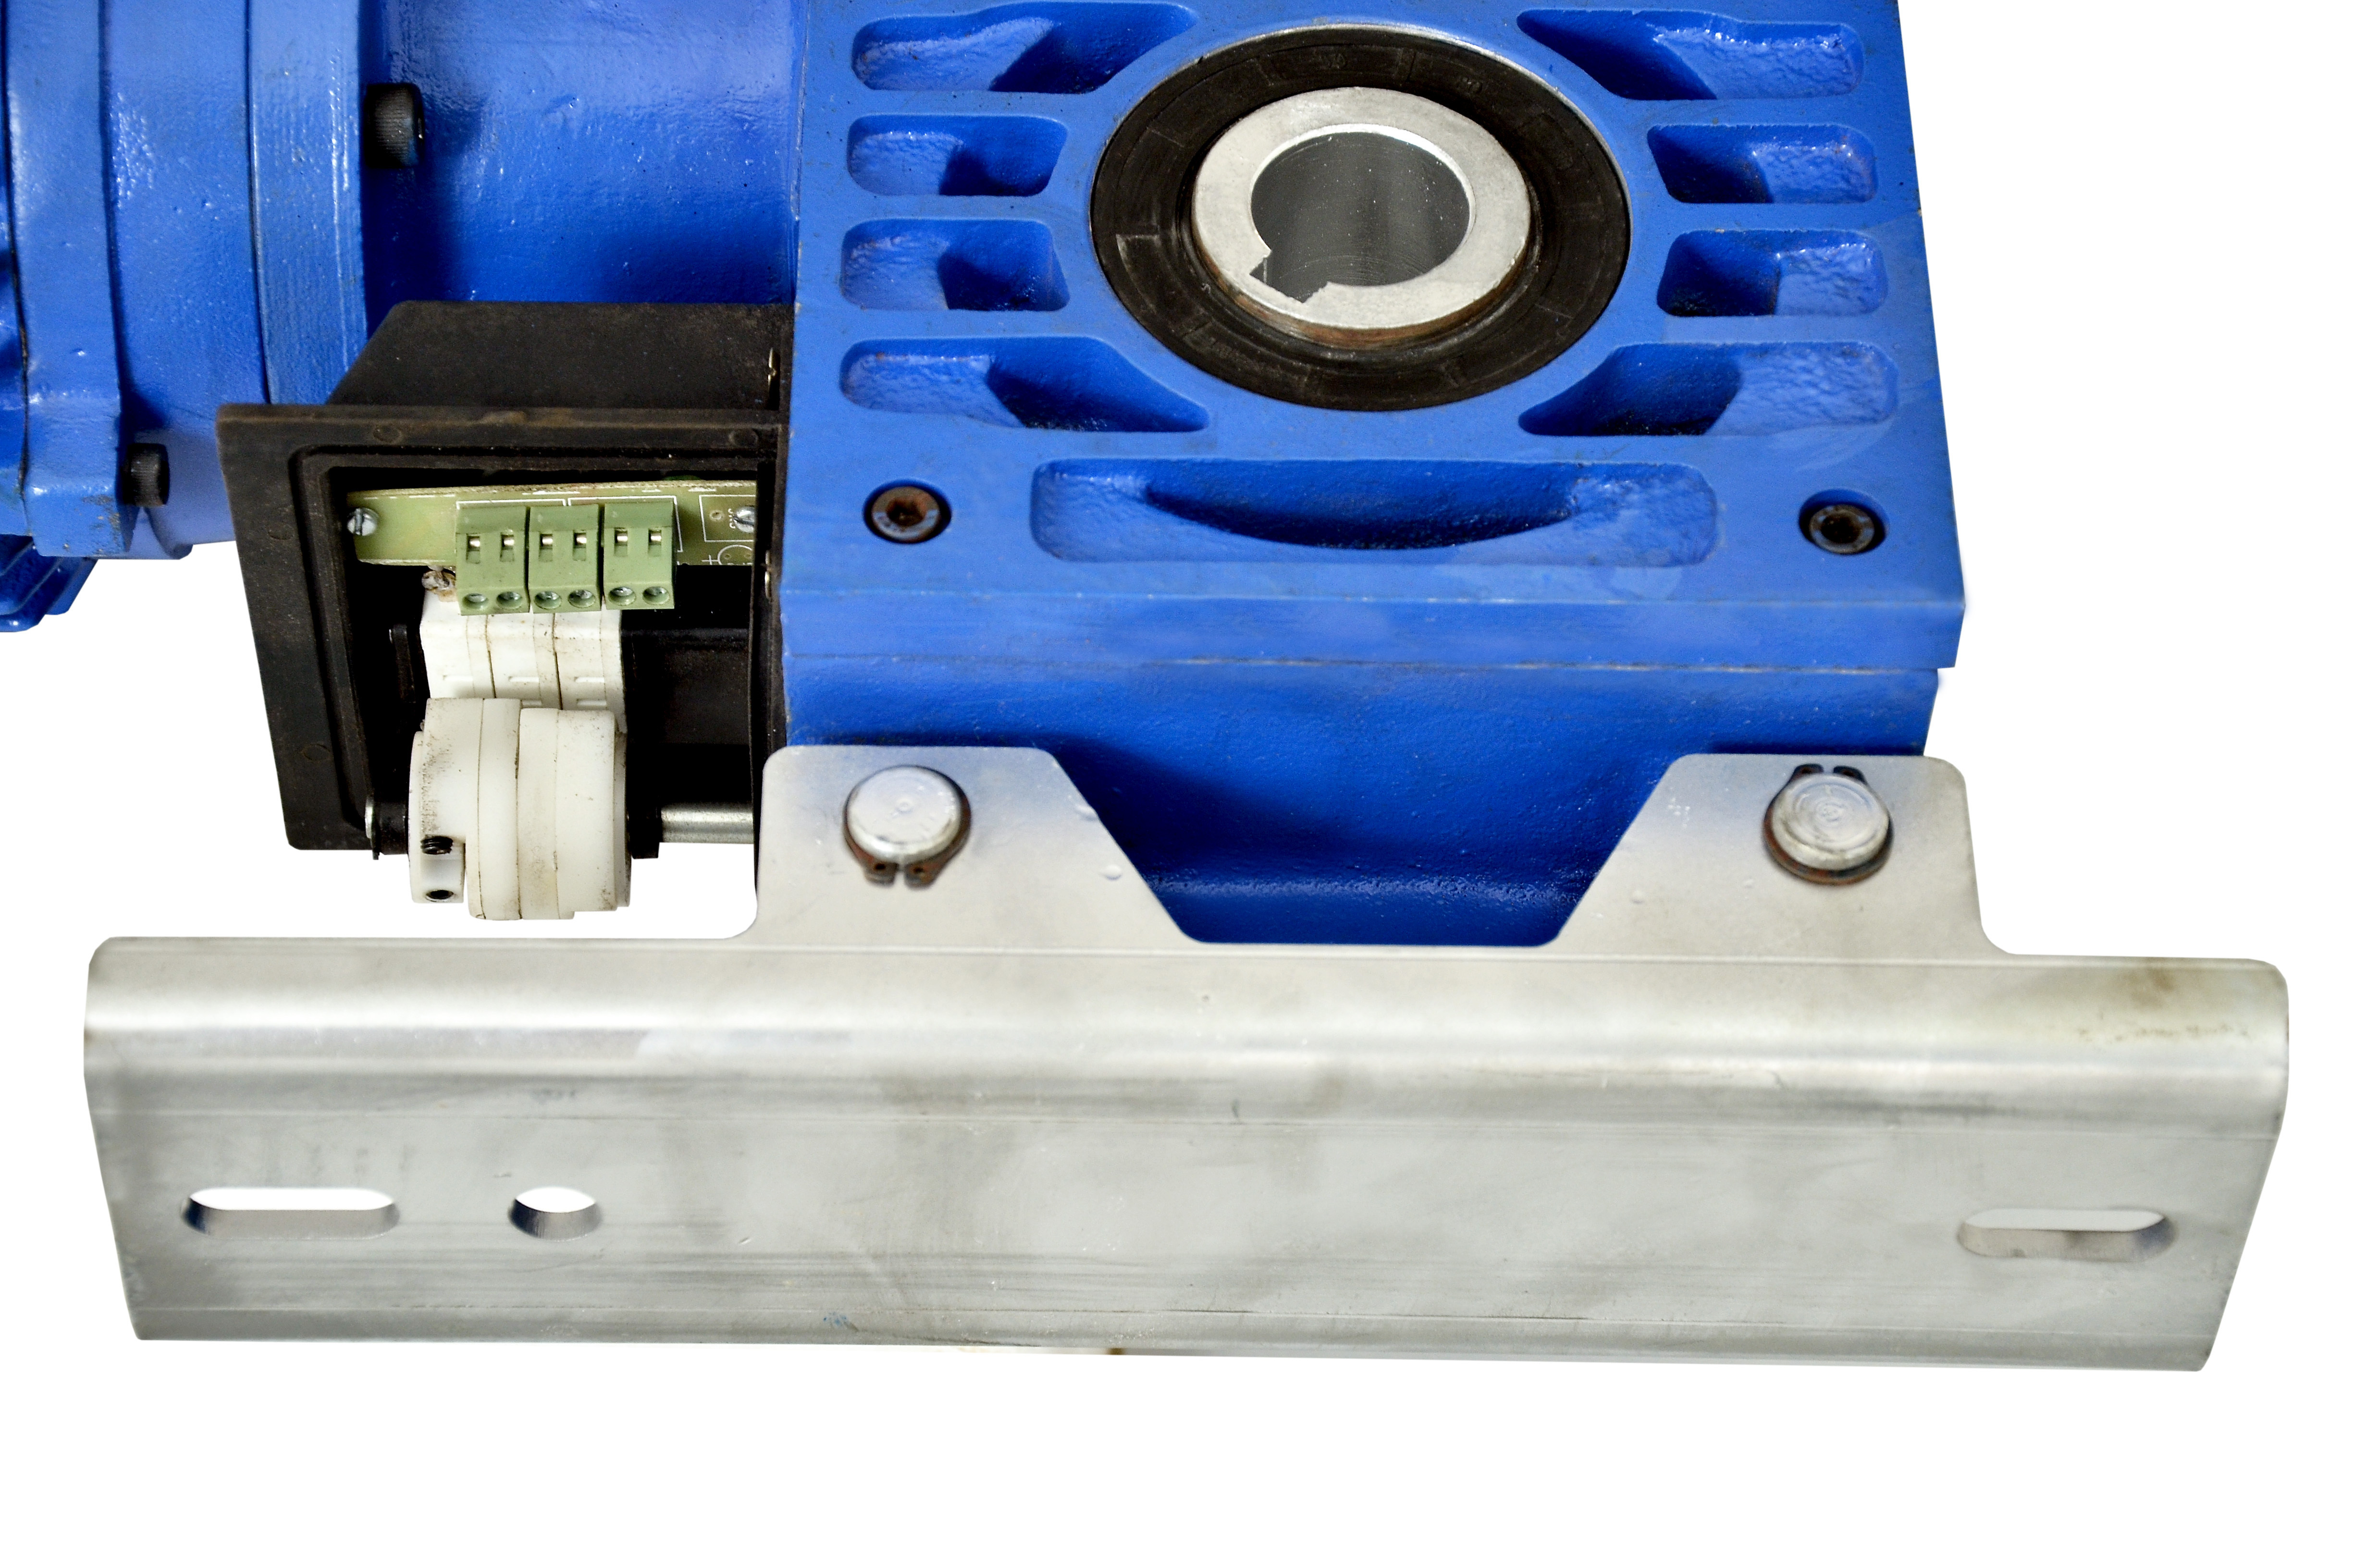 Direct Drive Rolling Shutter Gear box